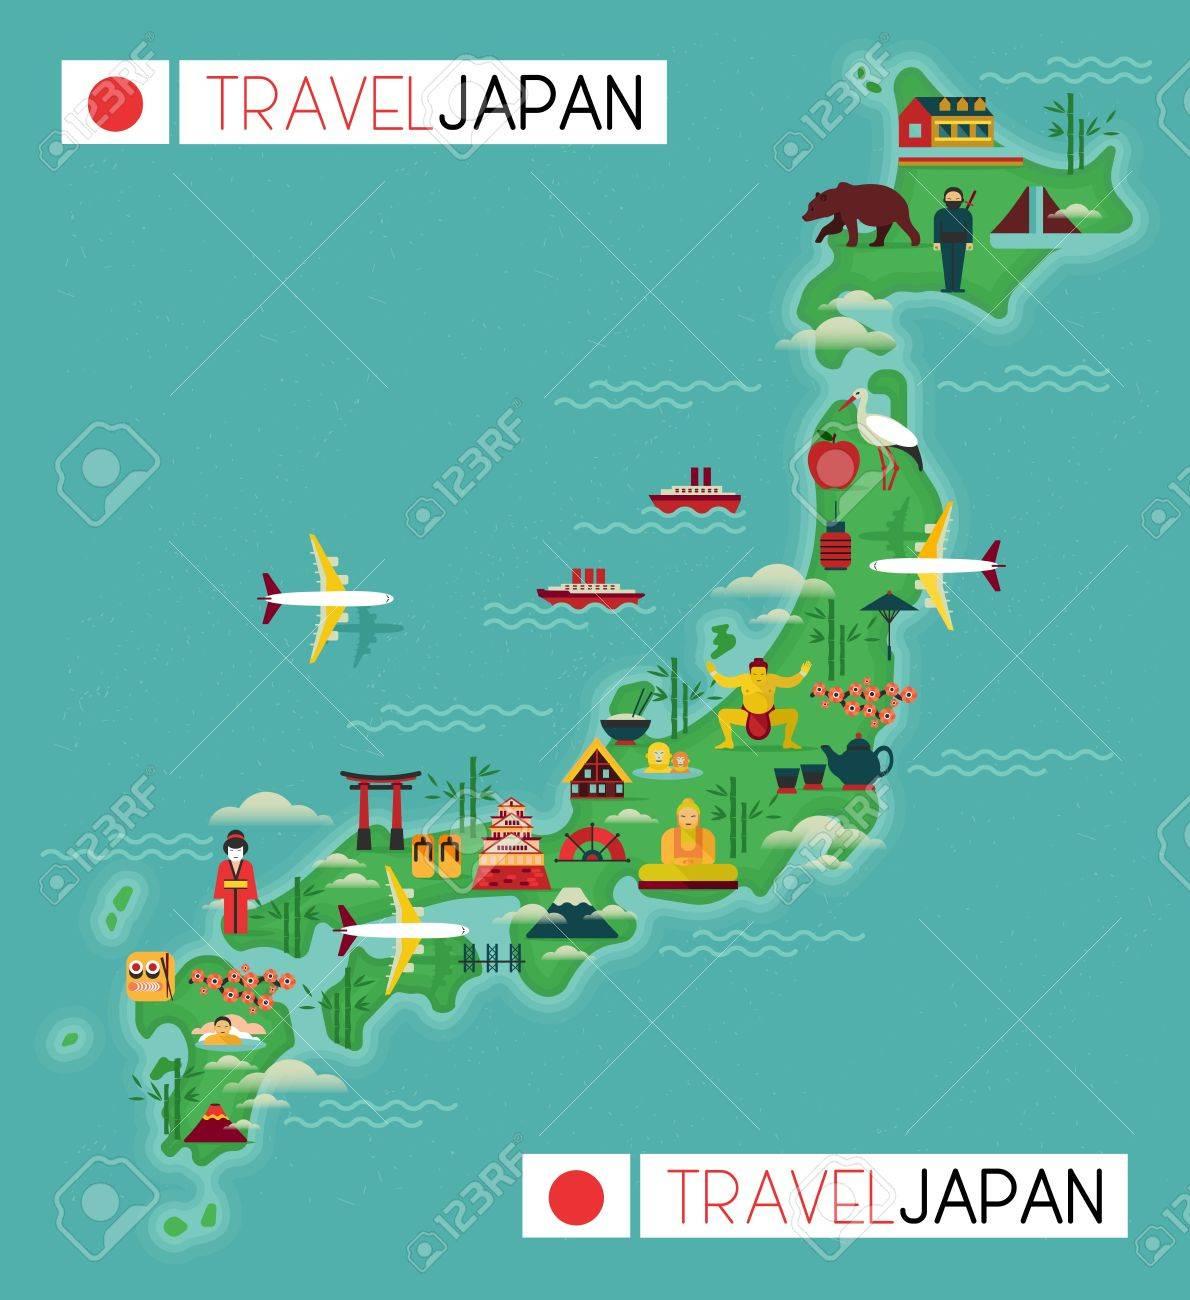 Japan Landmark And Travel Map Flat Design Elements And Icons - Japan map cartoon